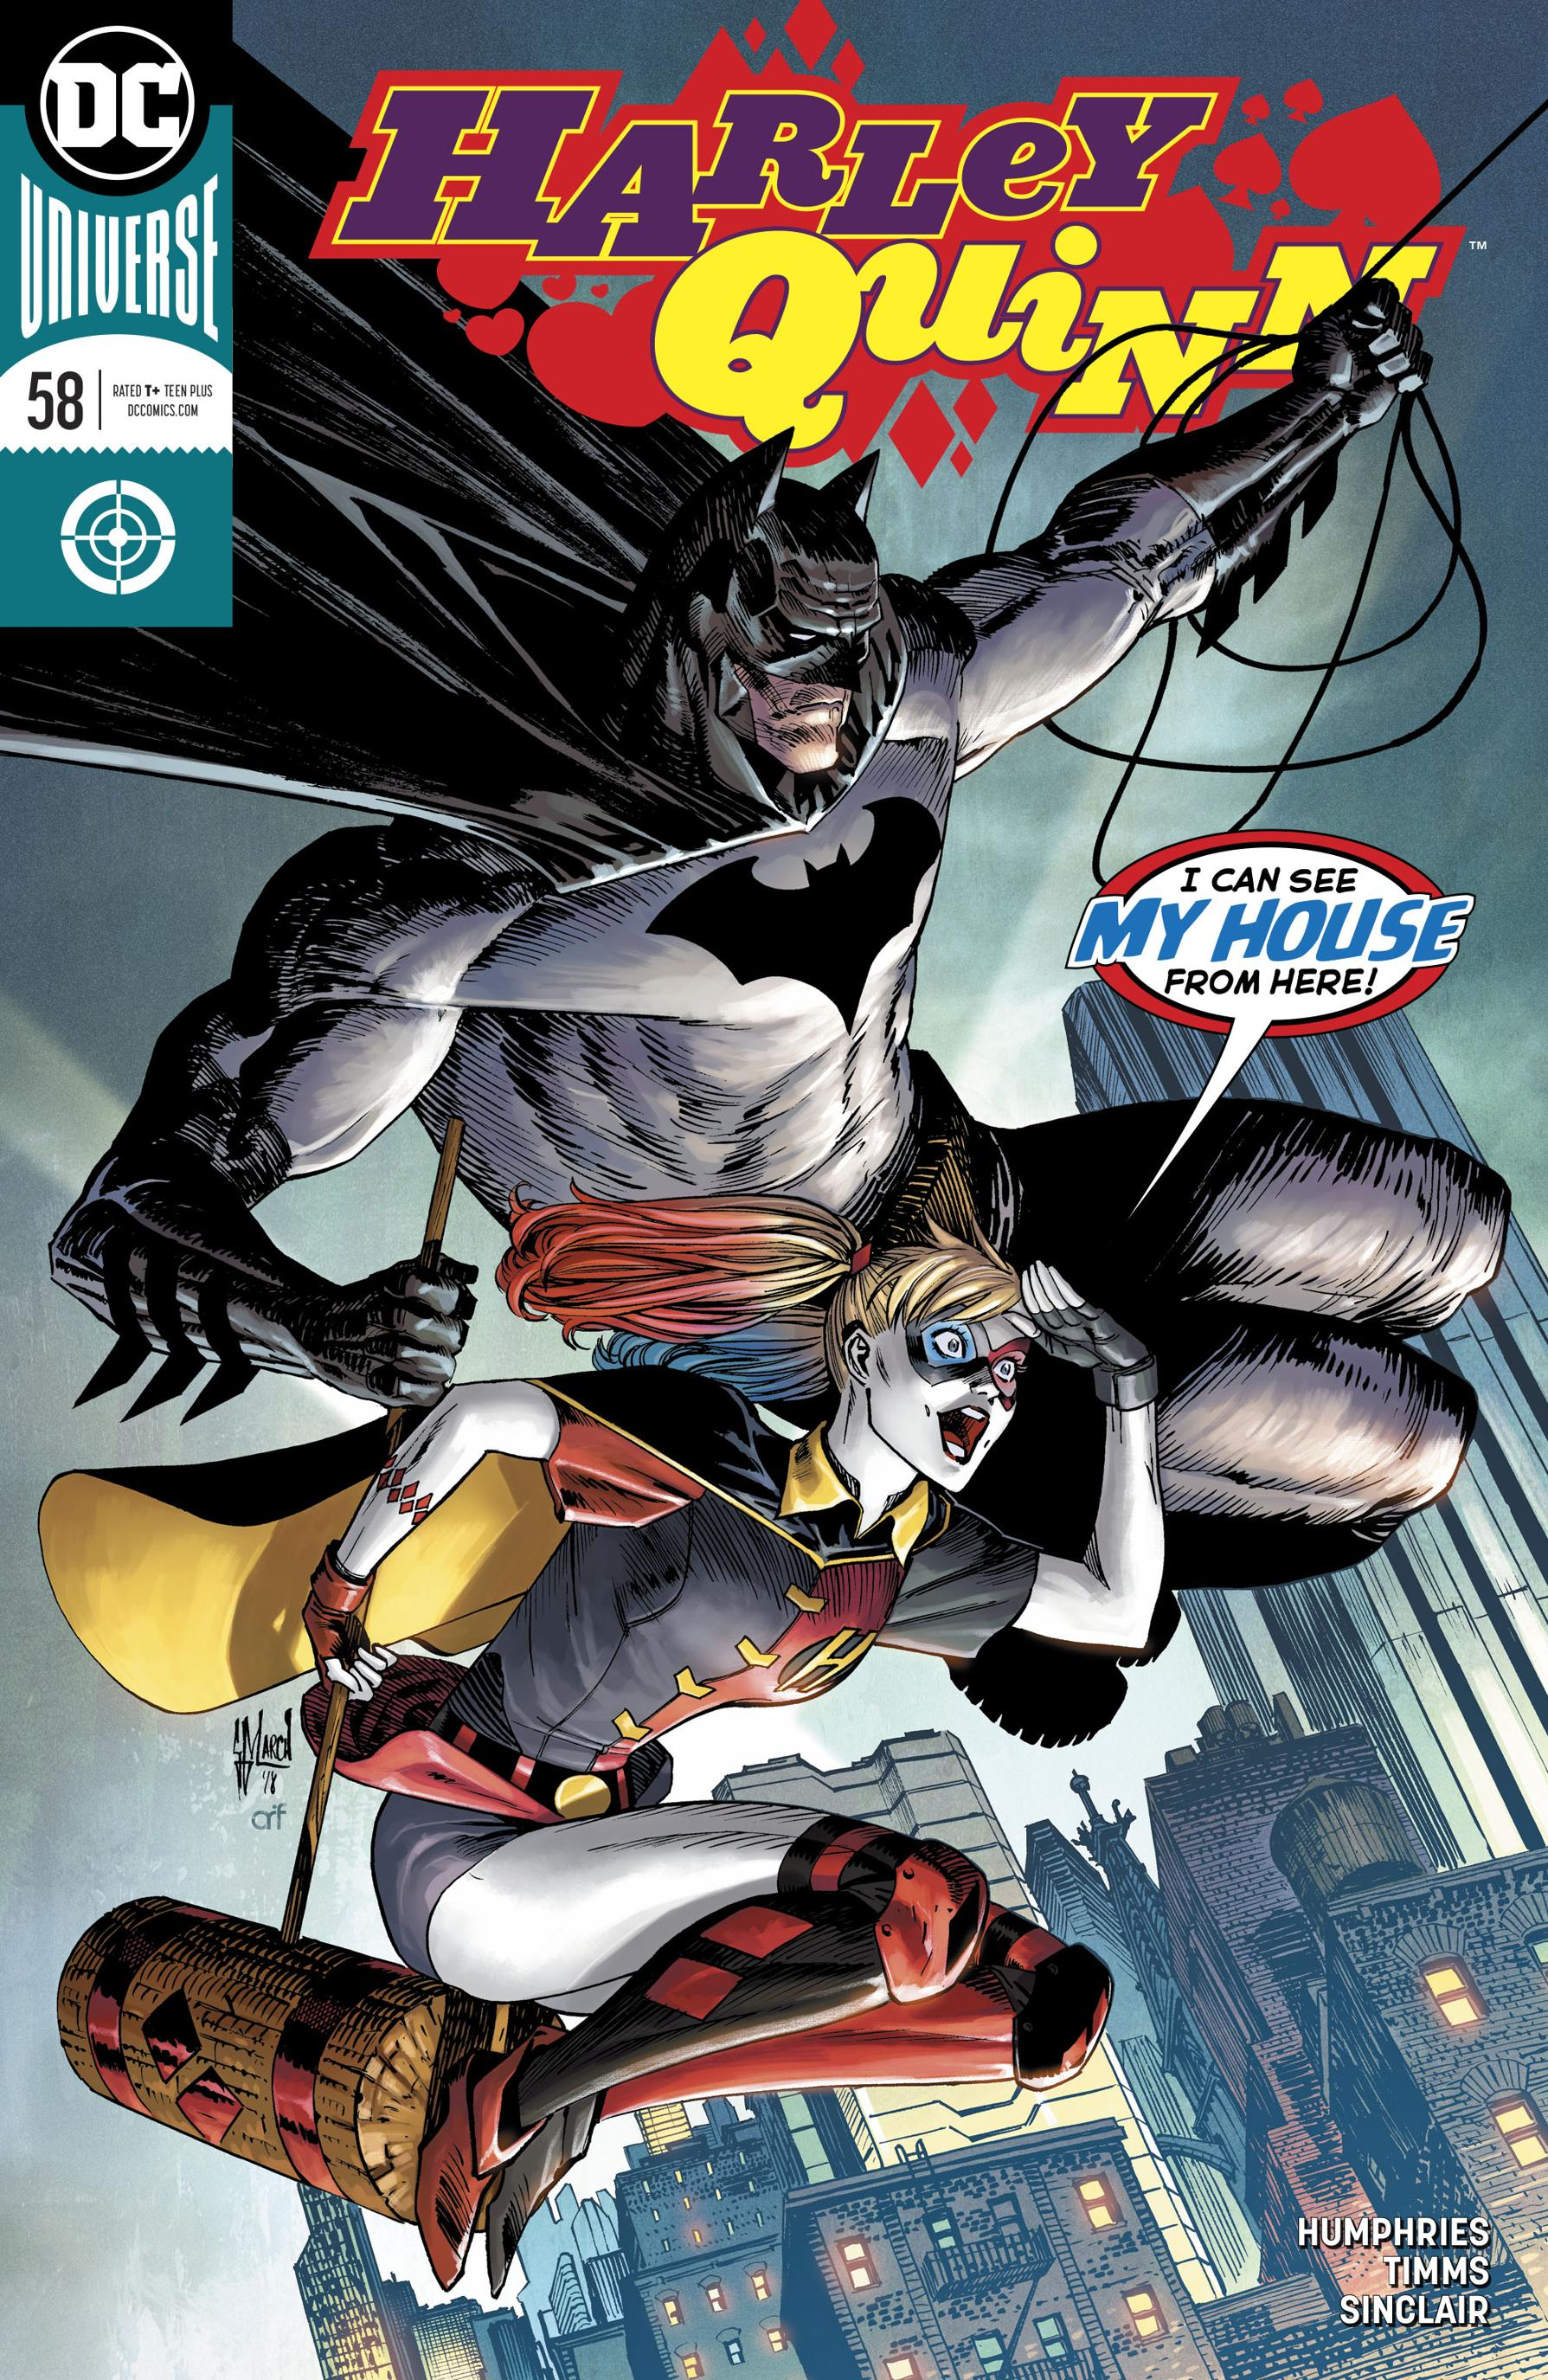 Harley Quinn 058 2019 2 covers Digital Zone